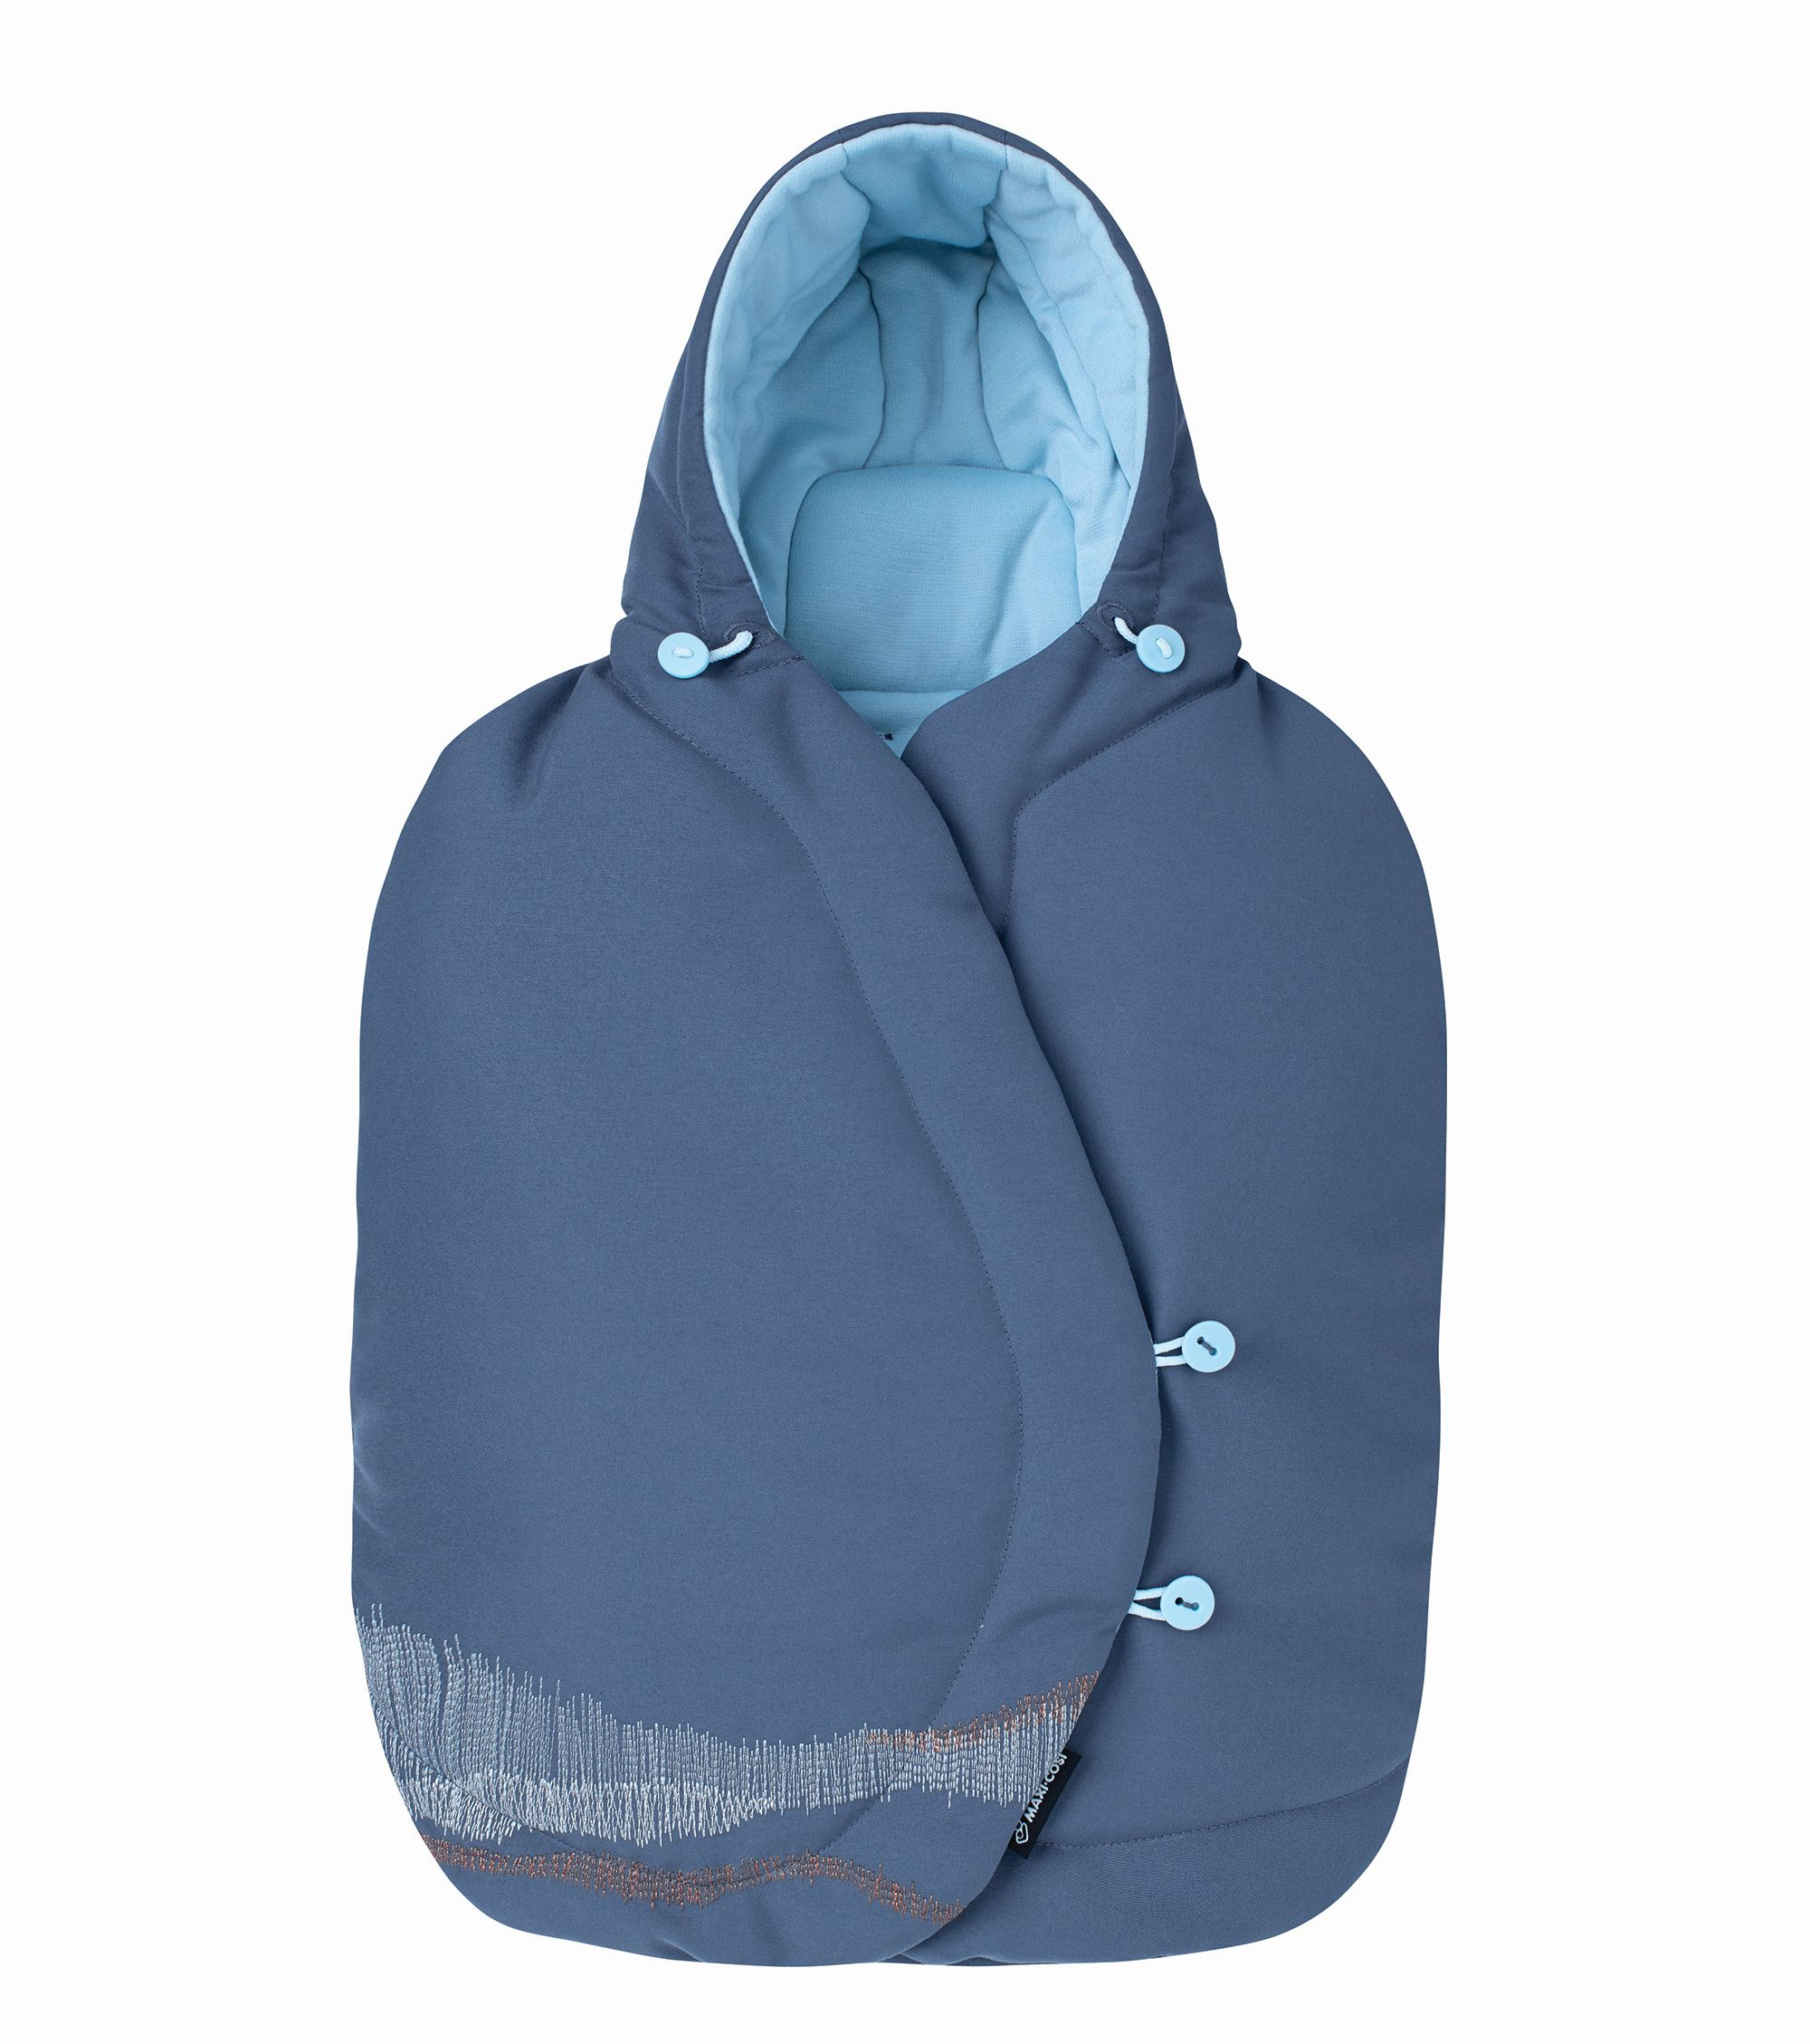 maxi cosi fu sack f r babyschale 2018 frequency blue online kaufen bei kidsroom kindersitze. Black Bedroom Furniture Sets. Home Design Ideas